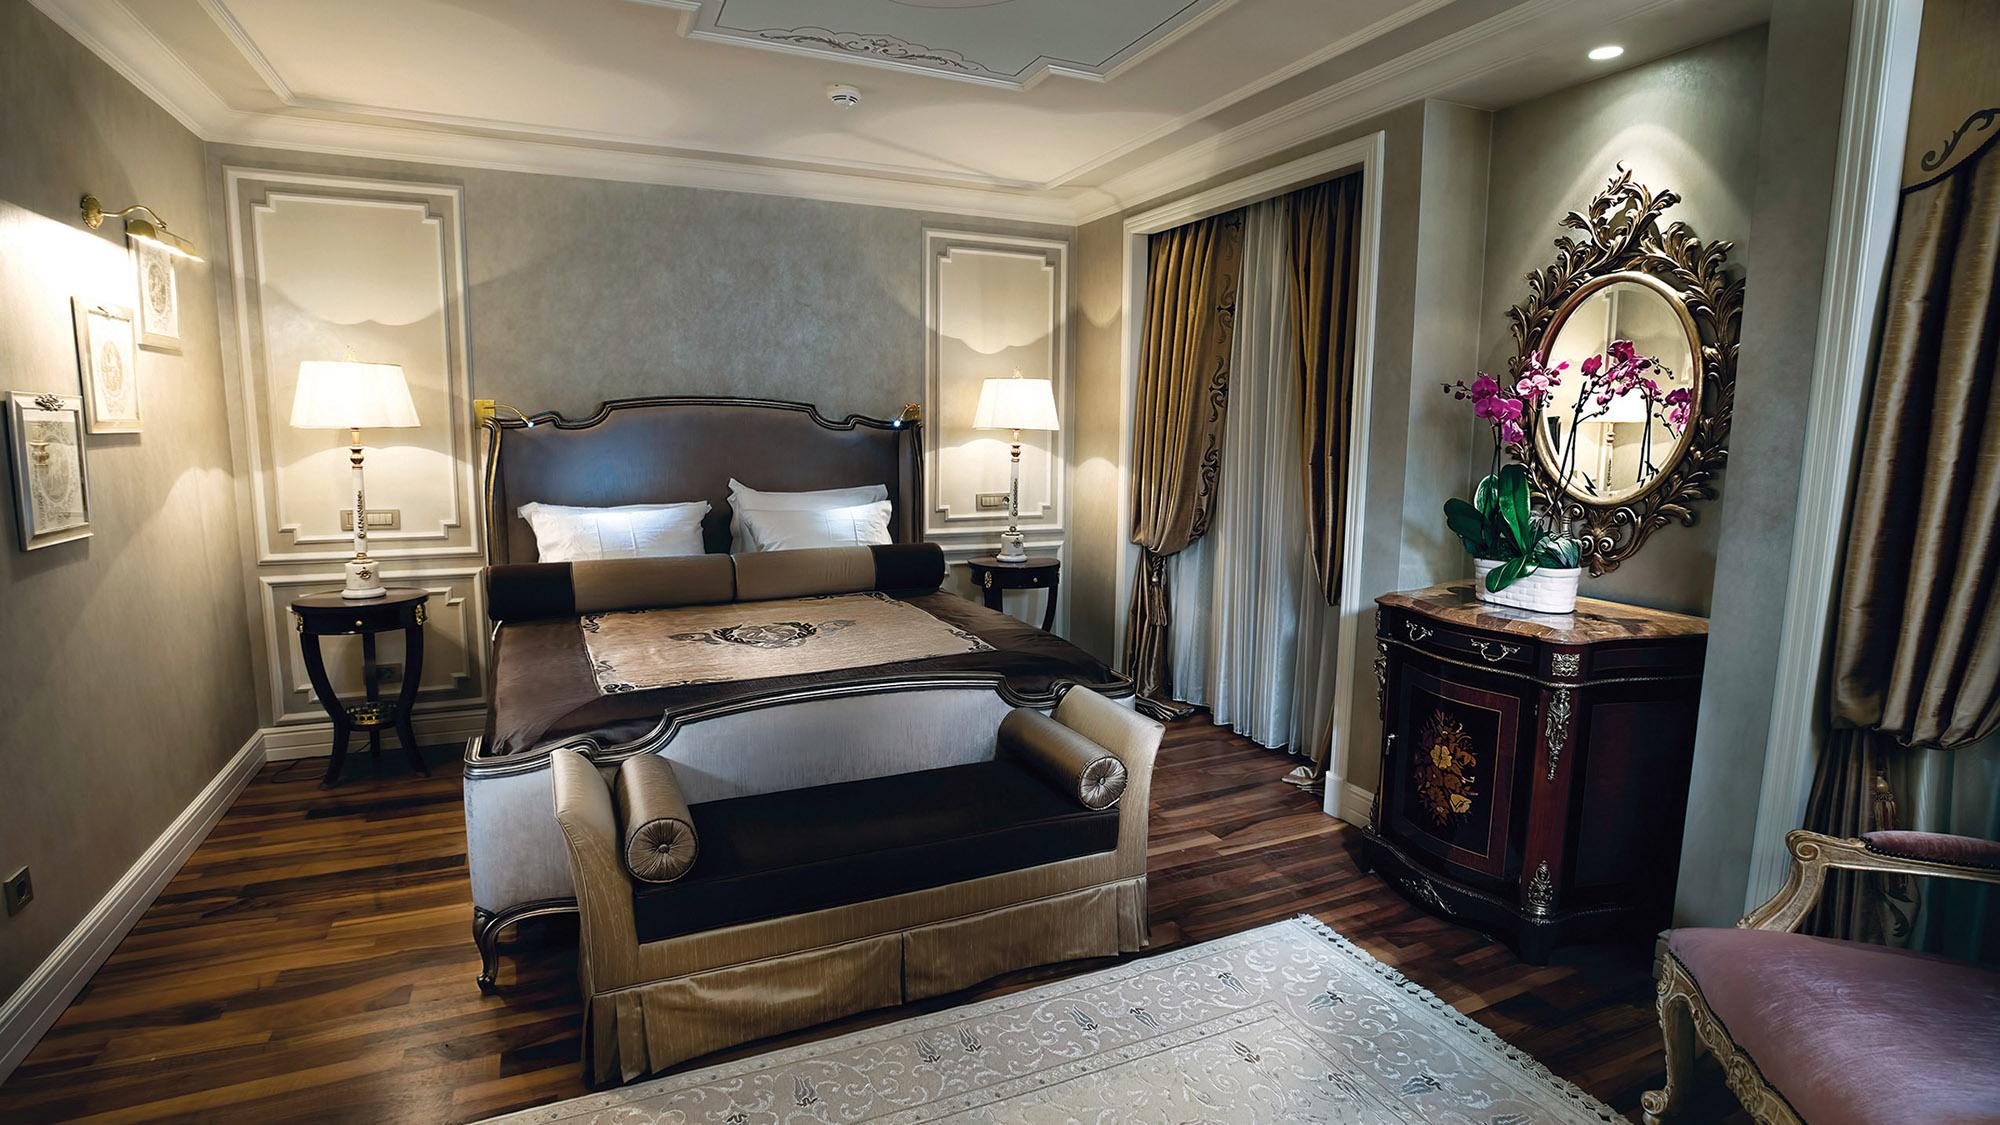 Location decor make rixos pera istanbul 39 s small wonder for Decor hotel istanbul